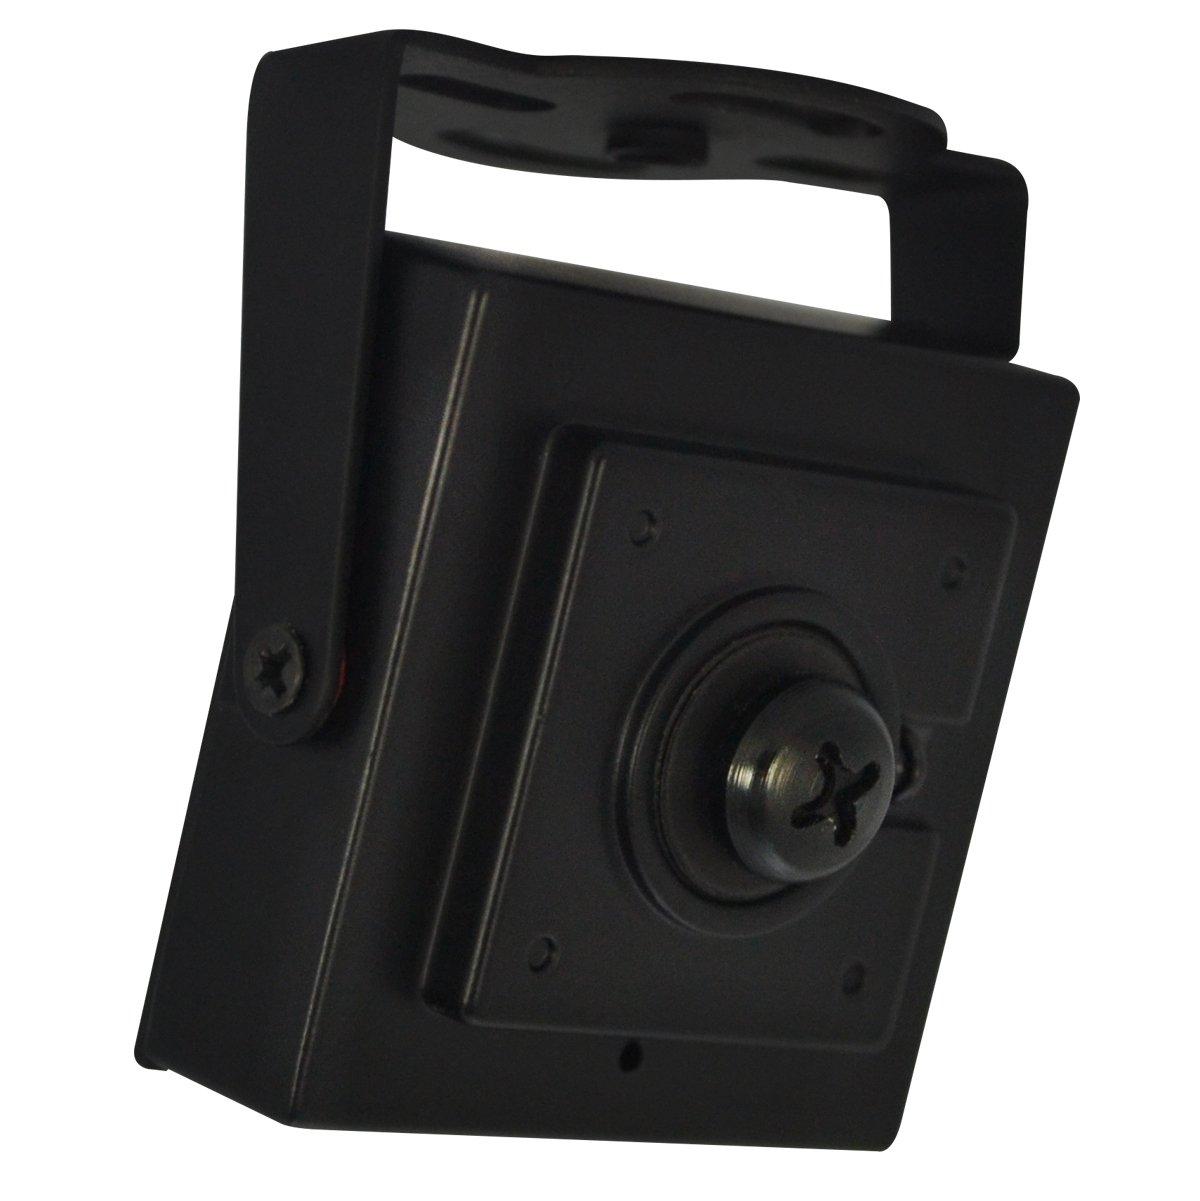 LineMak Mini Camera for indoors, 1/4'' HD Digital Sensor, 700TVL, 3.7mm Pinhole lens, for DVR or surveillance systems. by Linemak